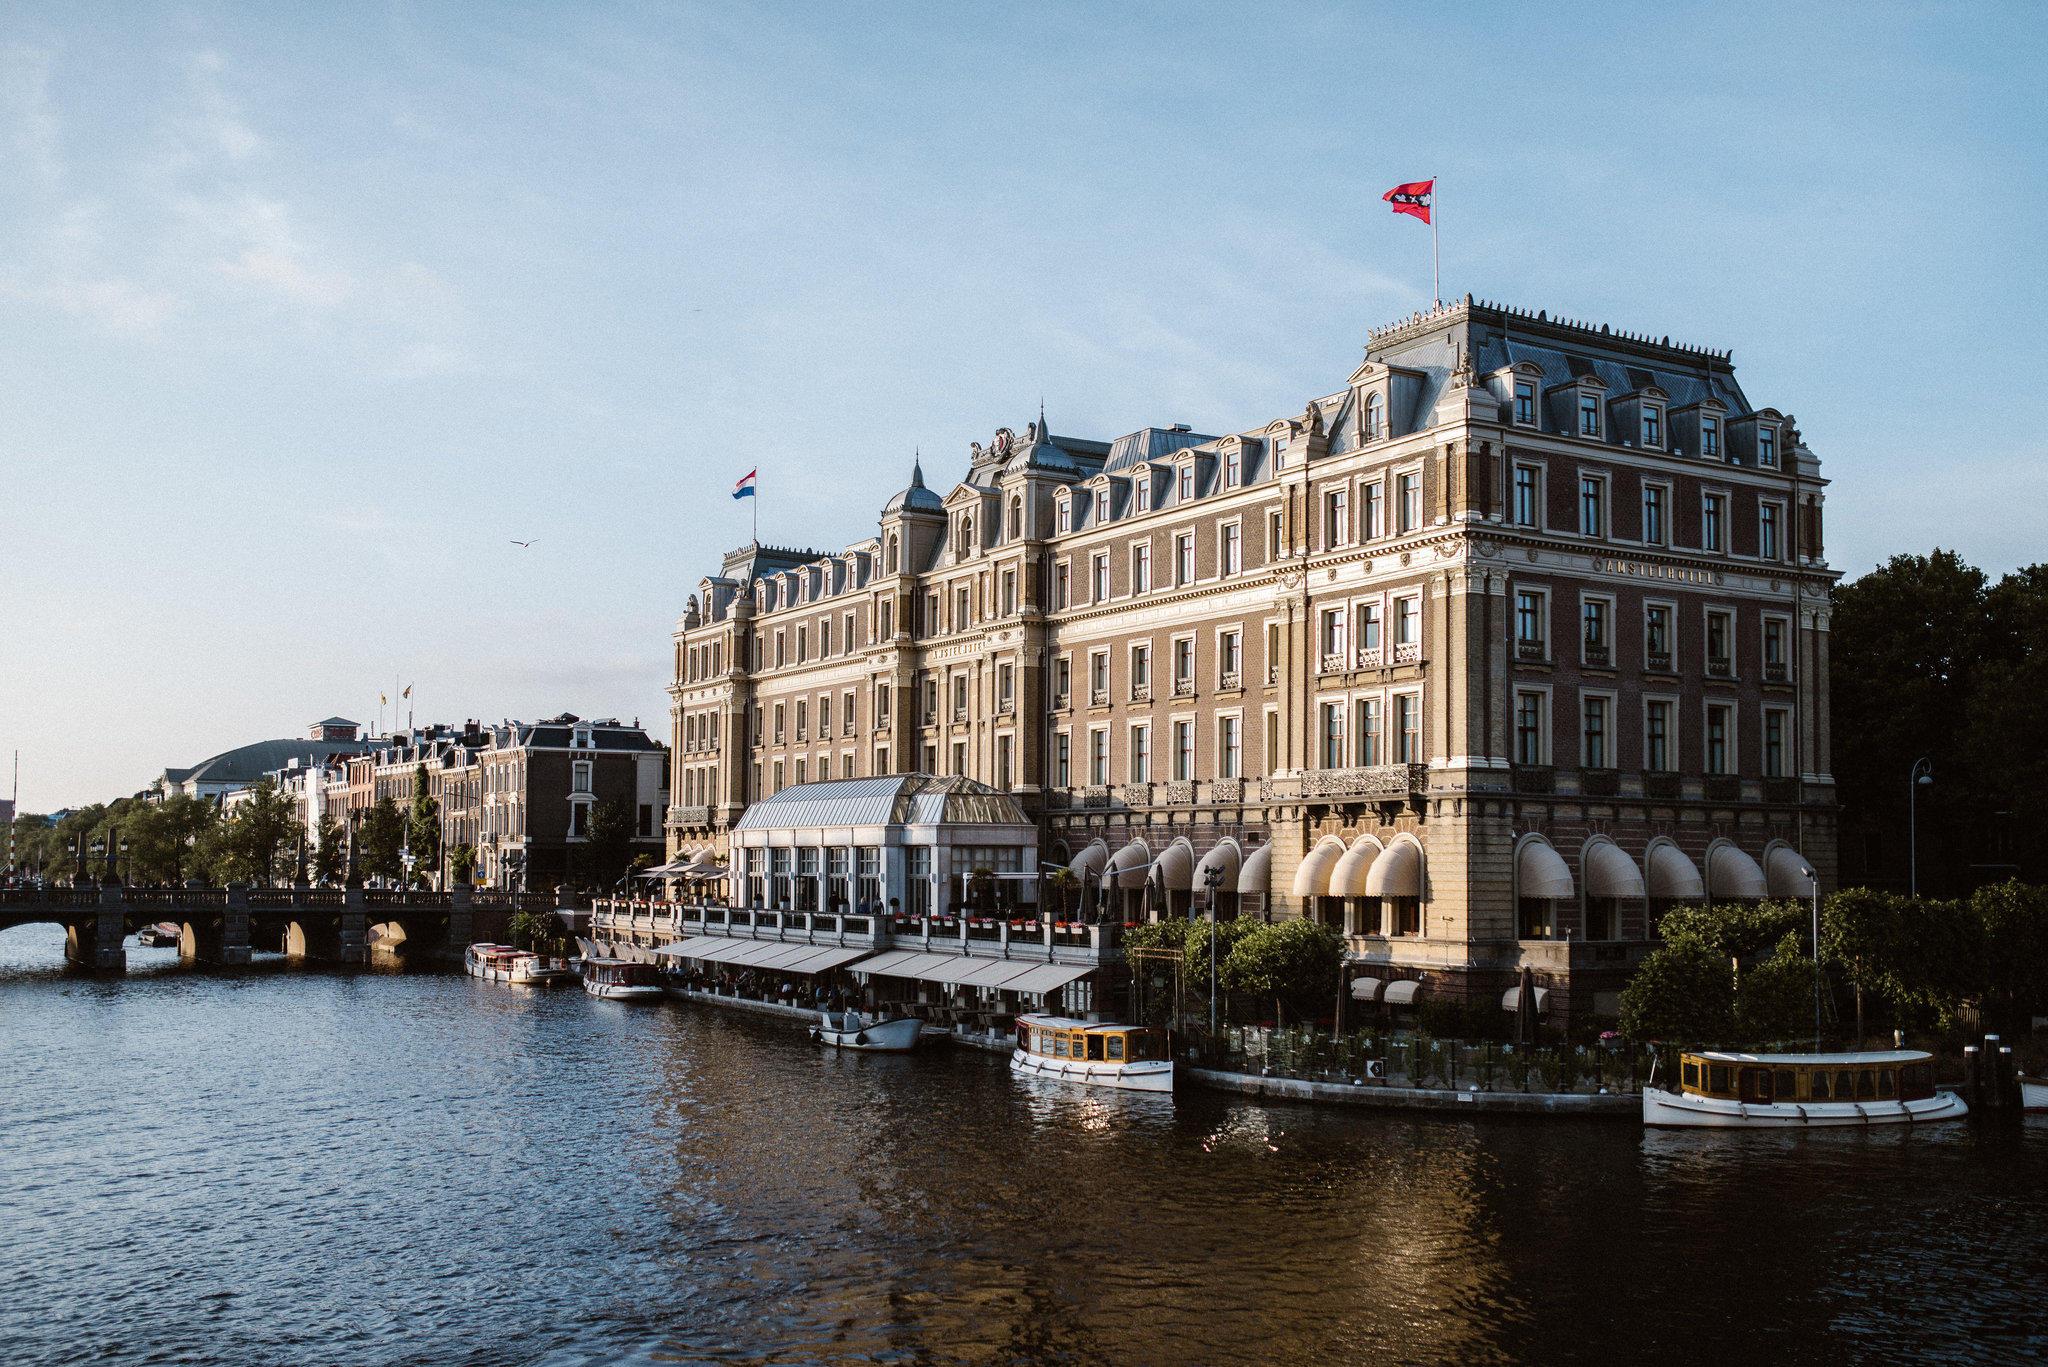 InterContinental Amstel Amsterdam, an IHG Hotel